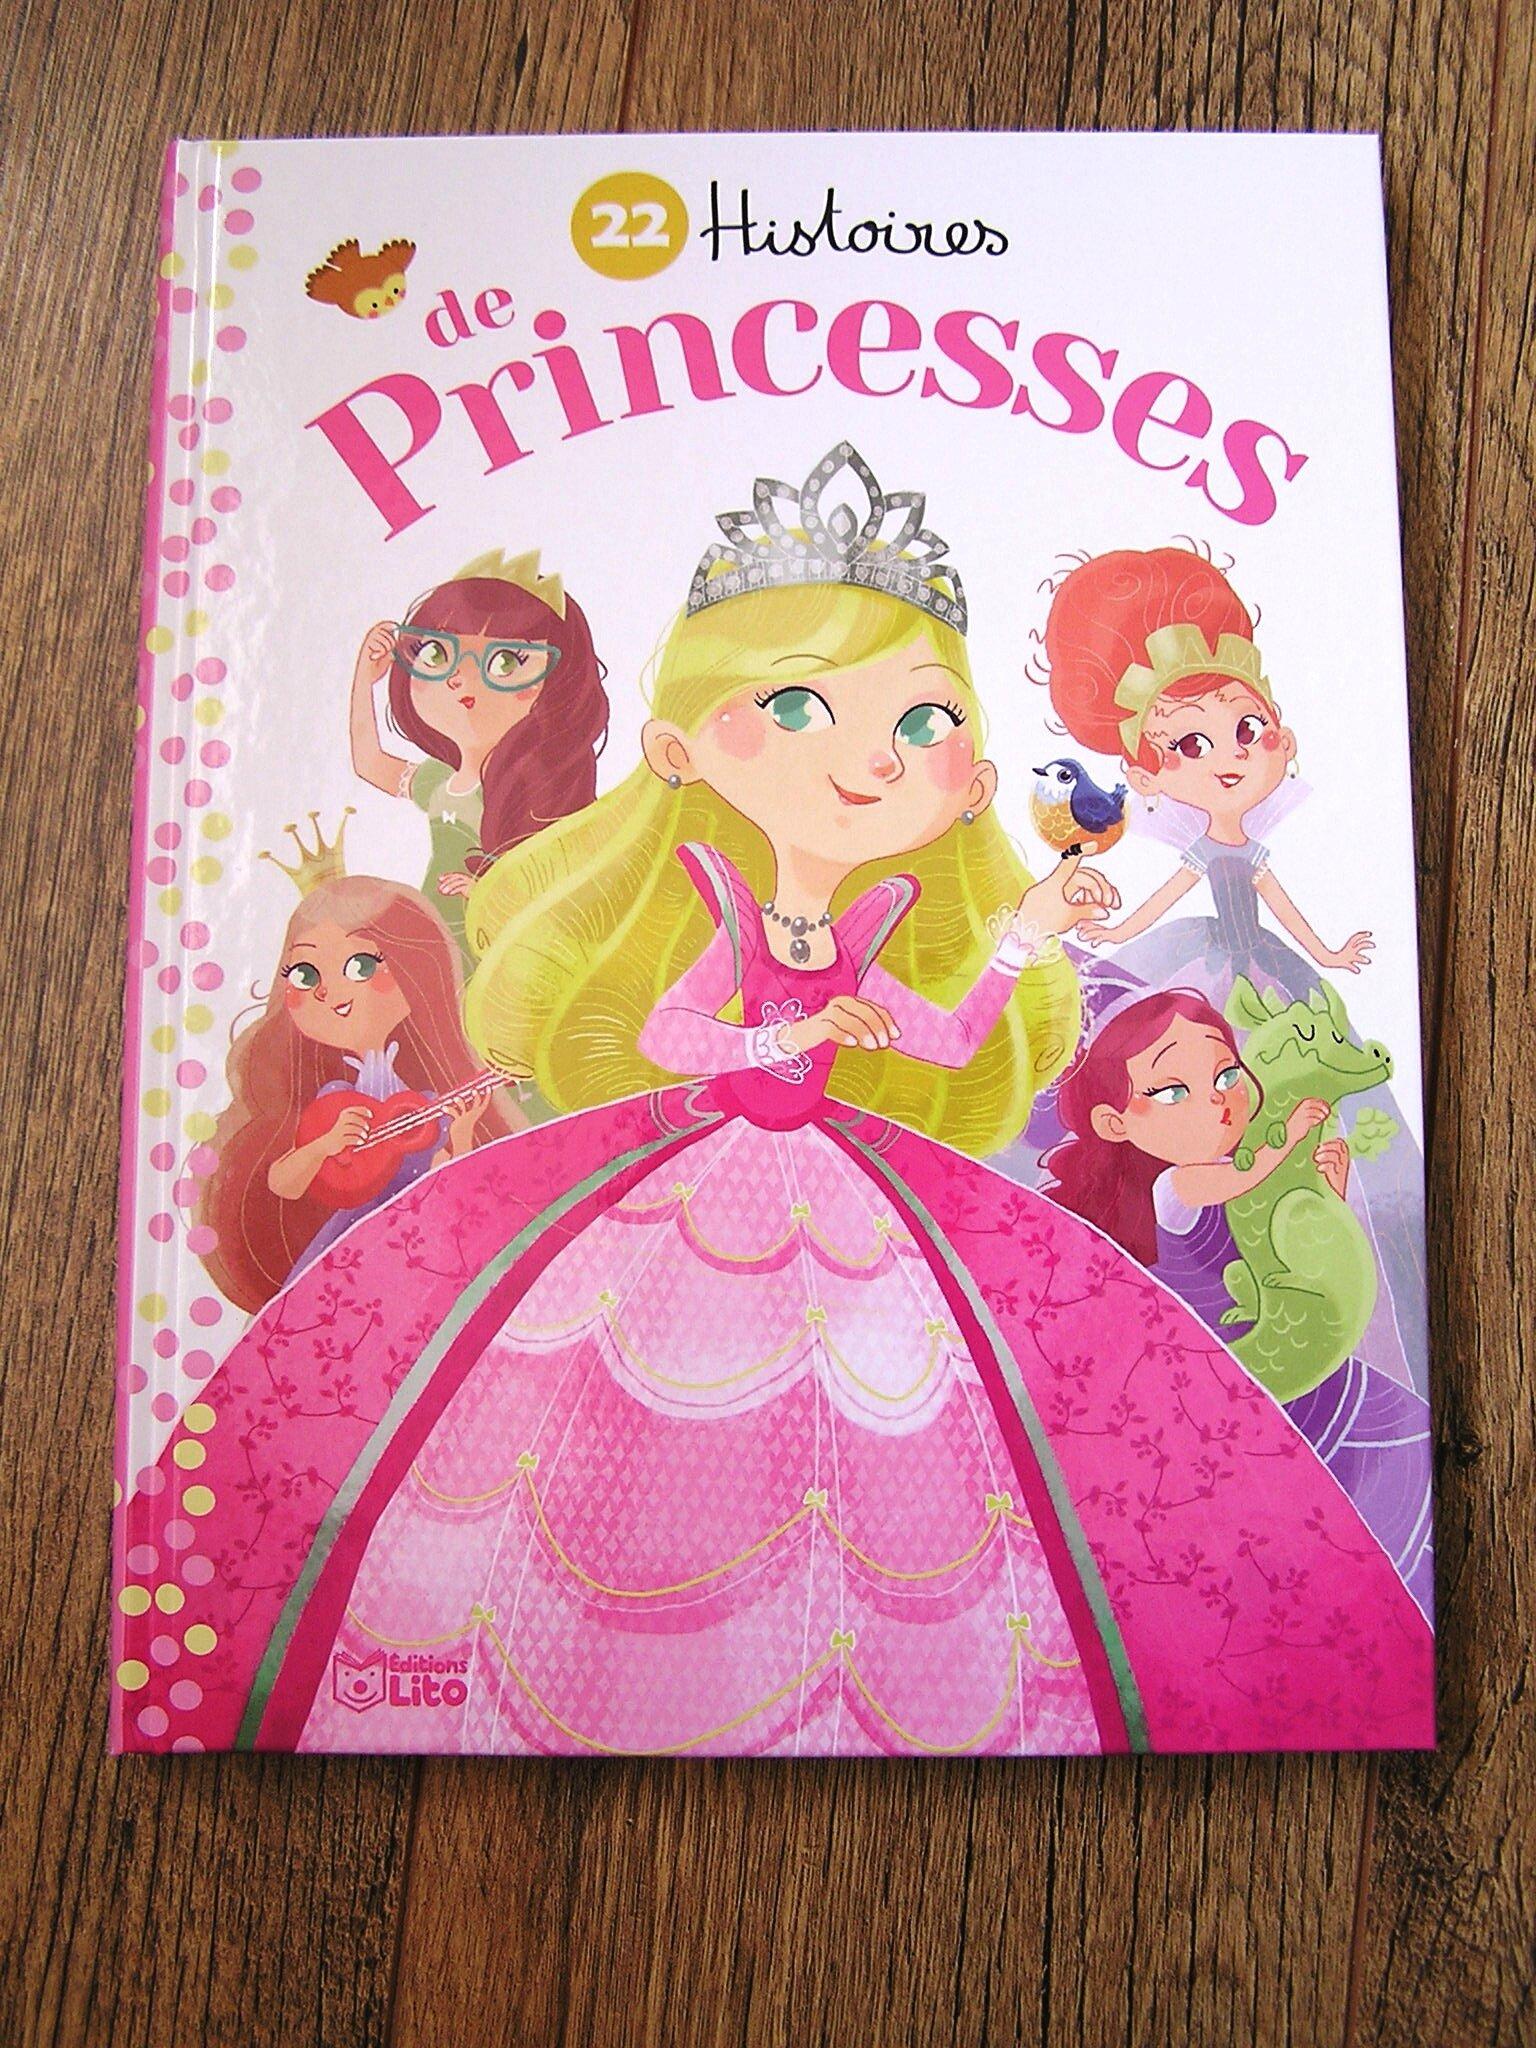 22 histoires de princesses c line riffard illustratrice jeunesse. Black Bedroom Furniture Sets. Home Design Ideas